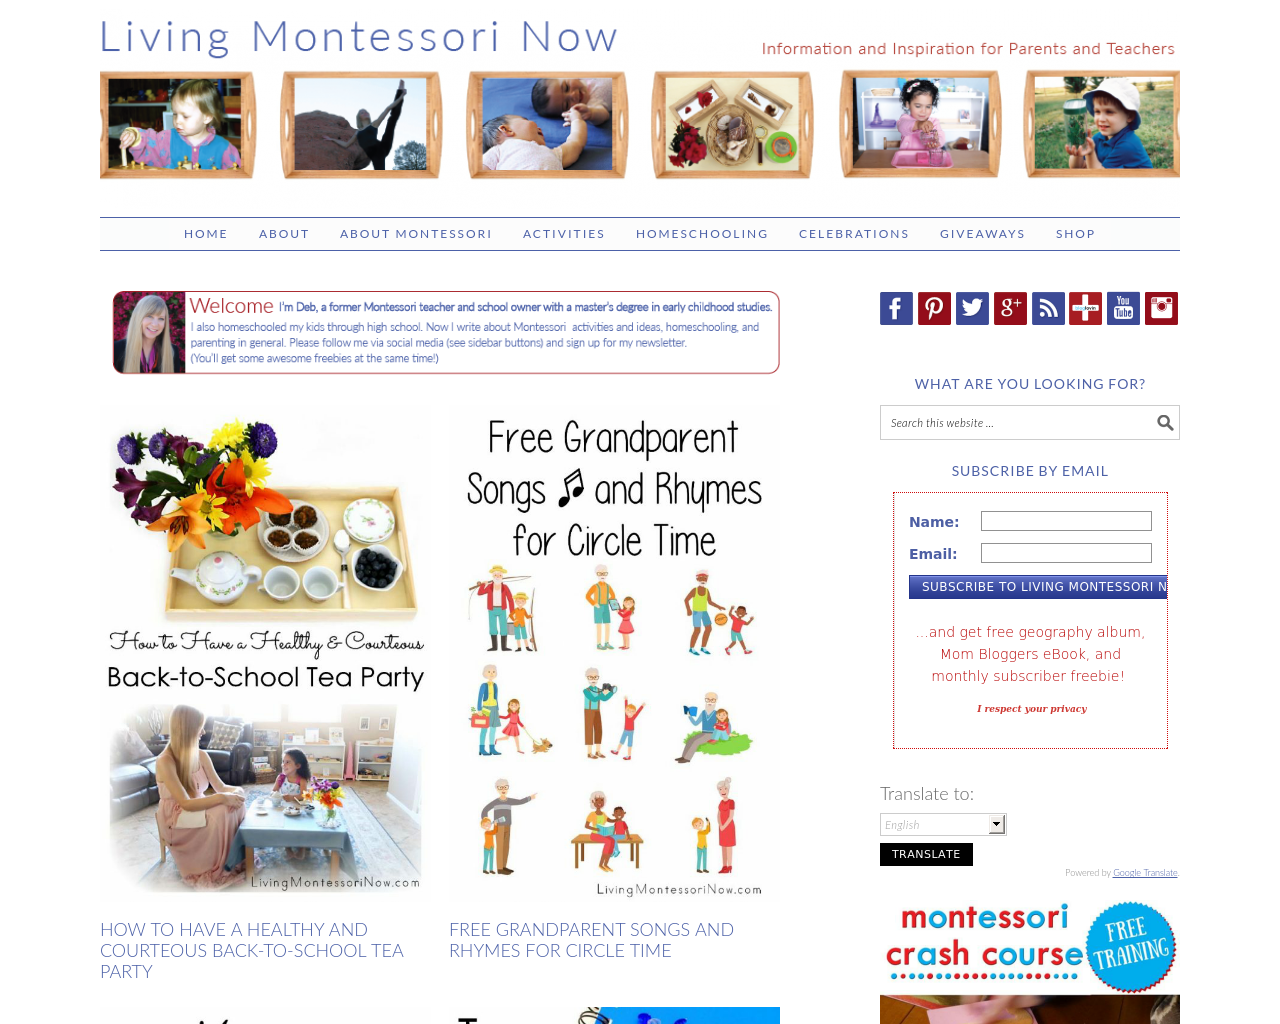 Living-Montessori-Now-Advertising-Reviews-Pricing